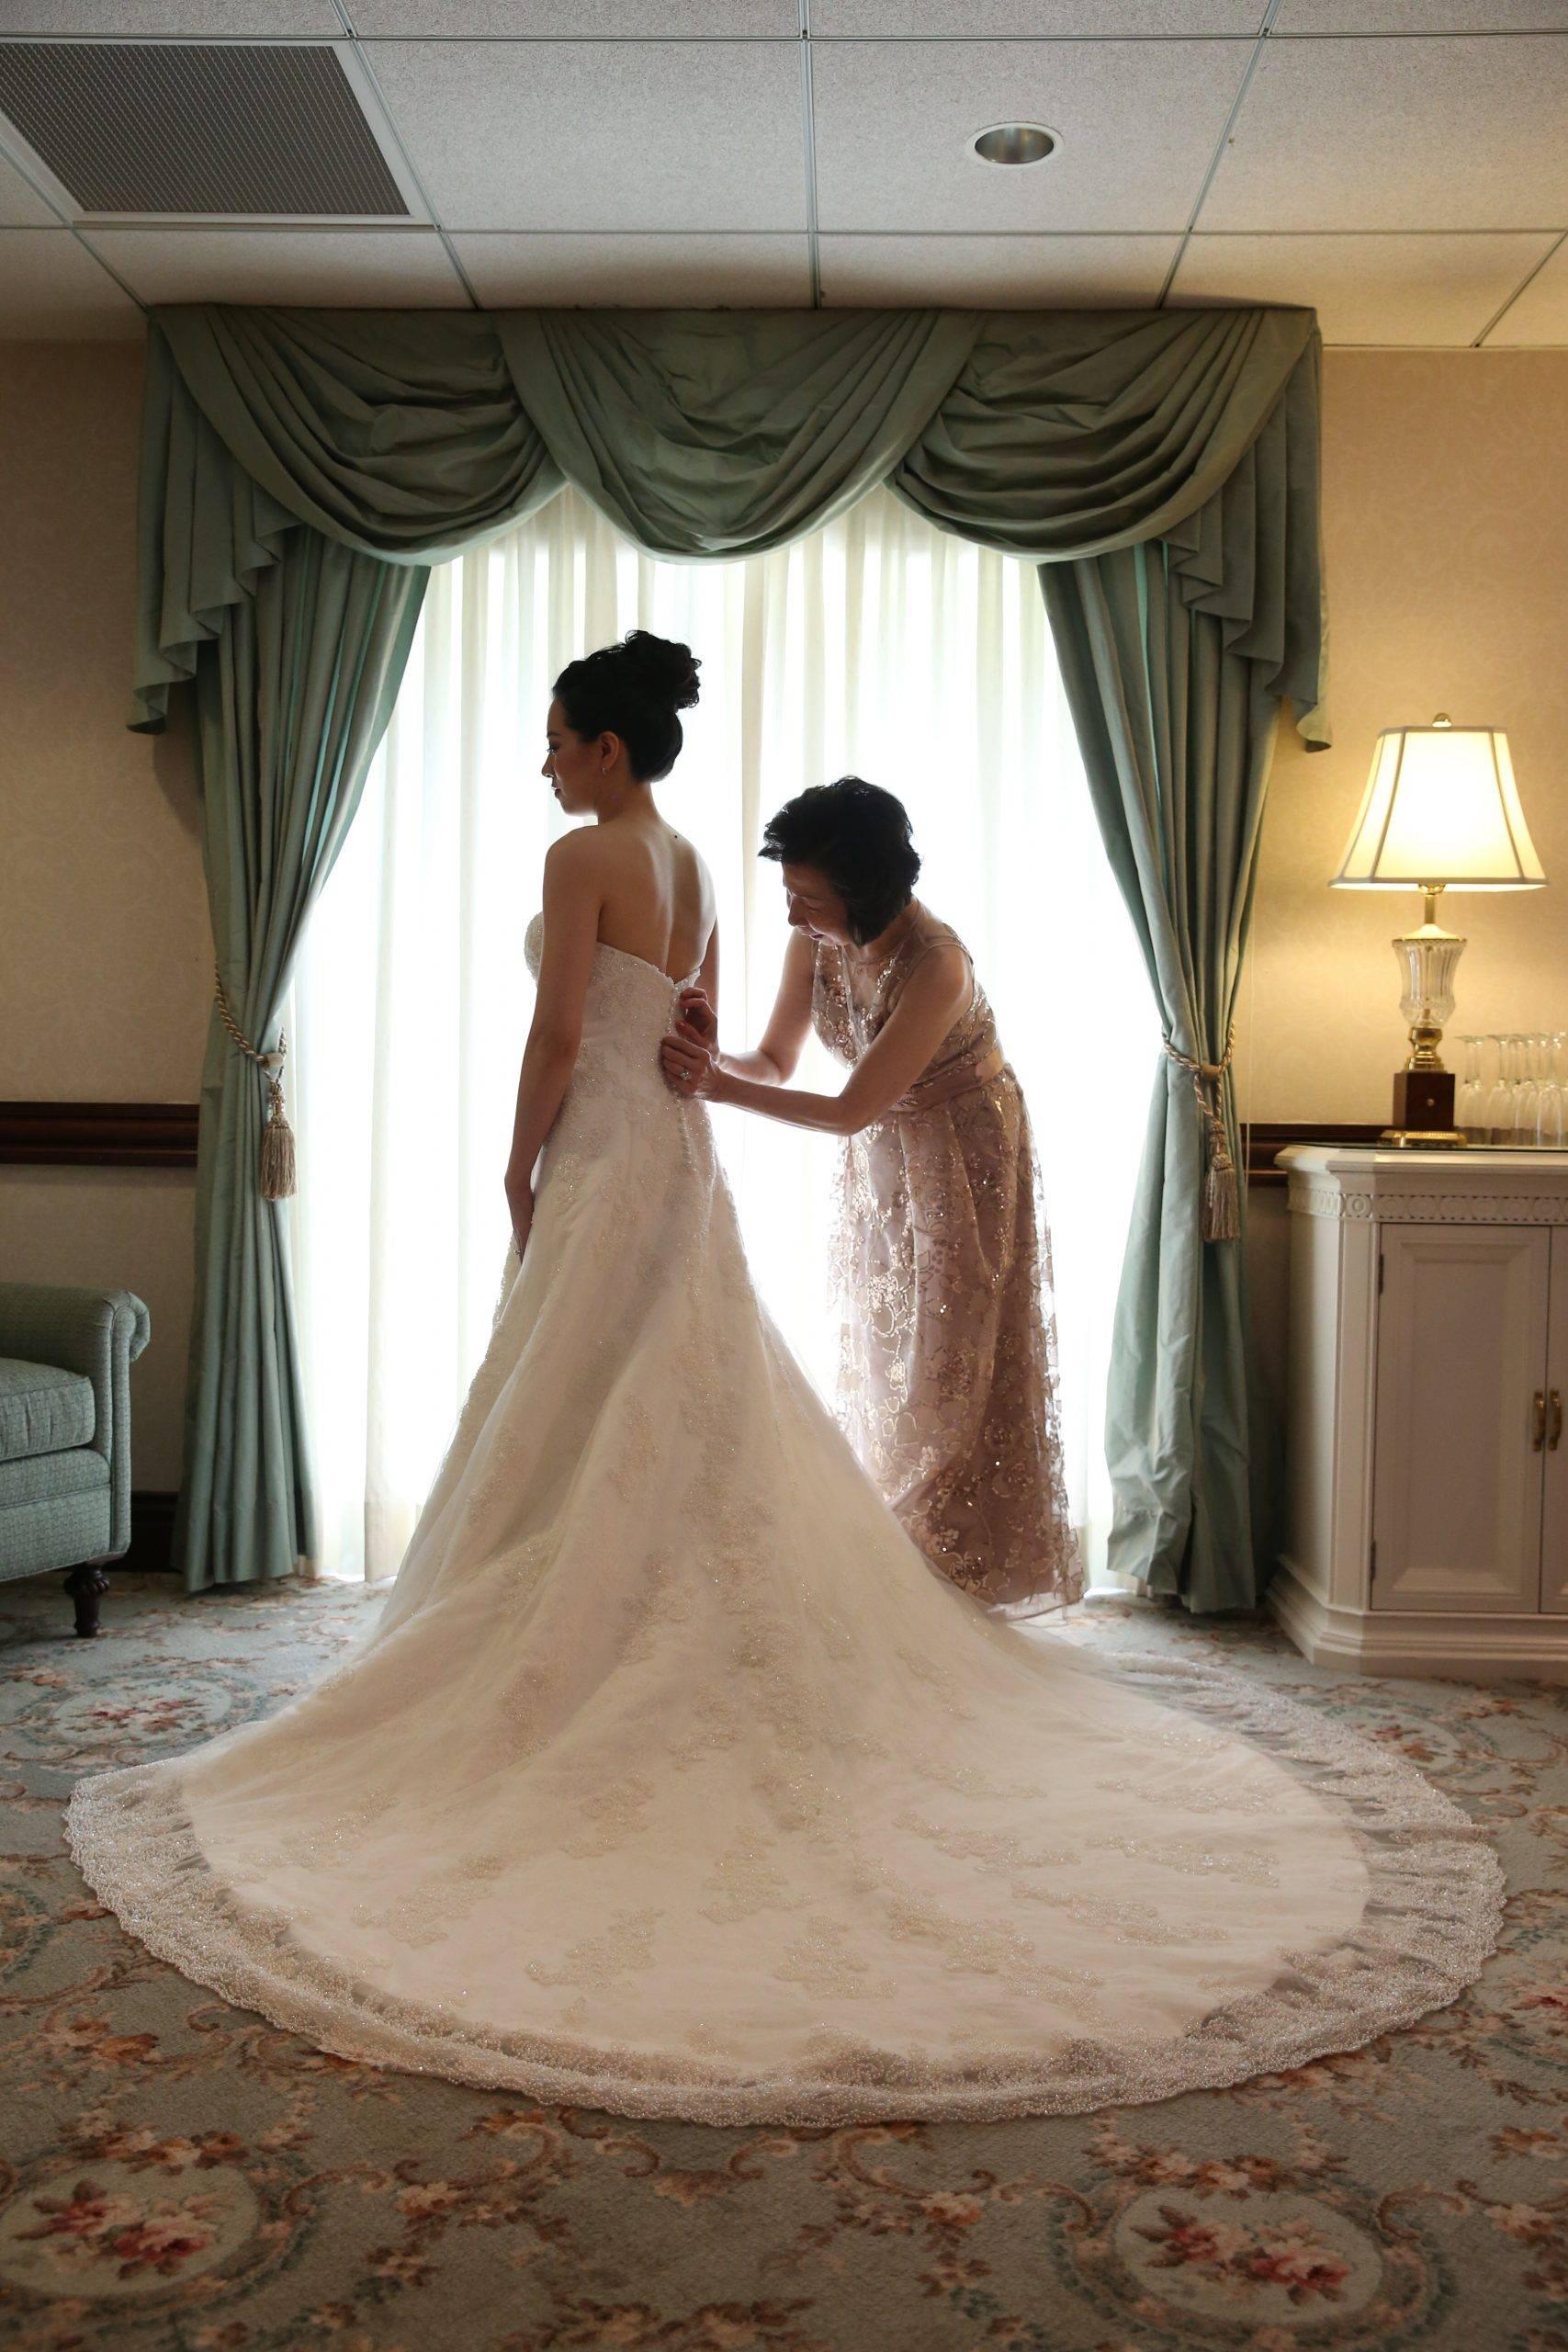 Brooklake mother of the bride helping bride get dressed